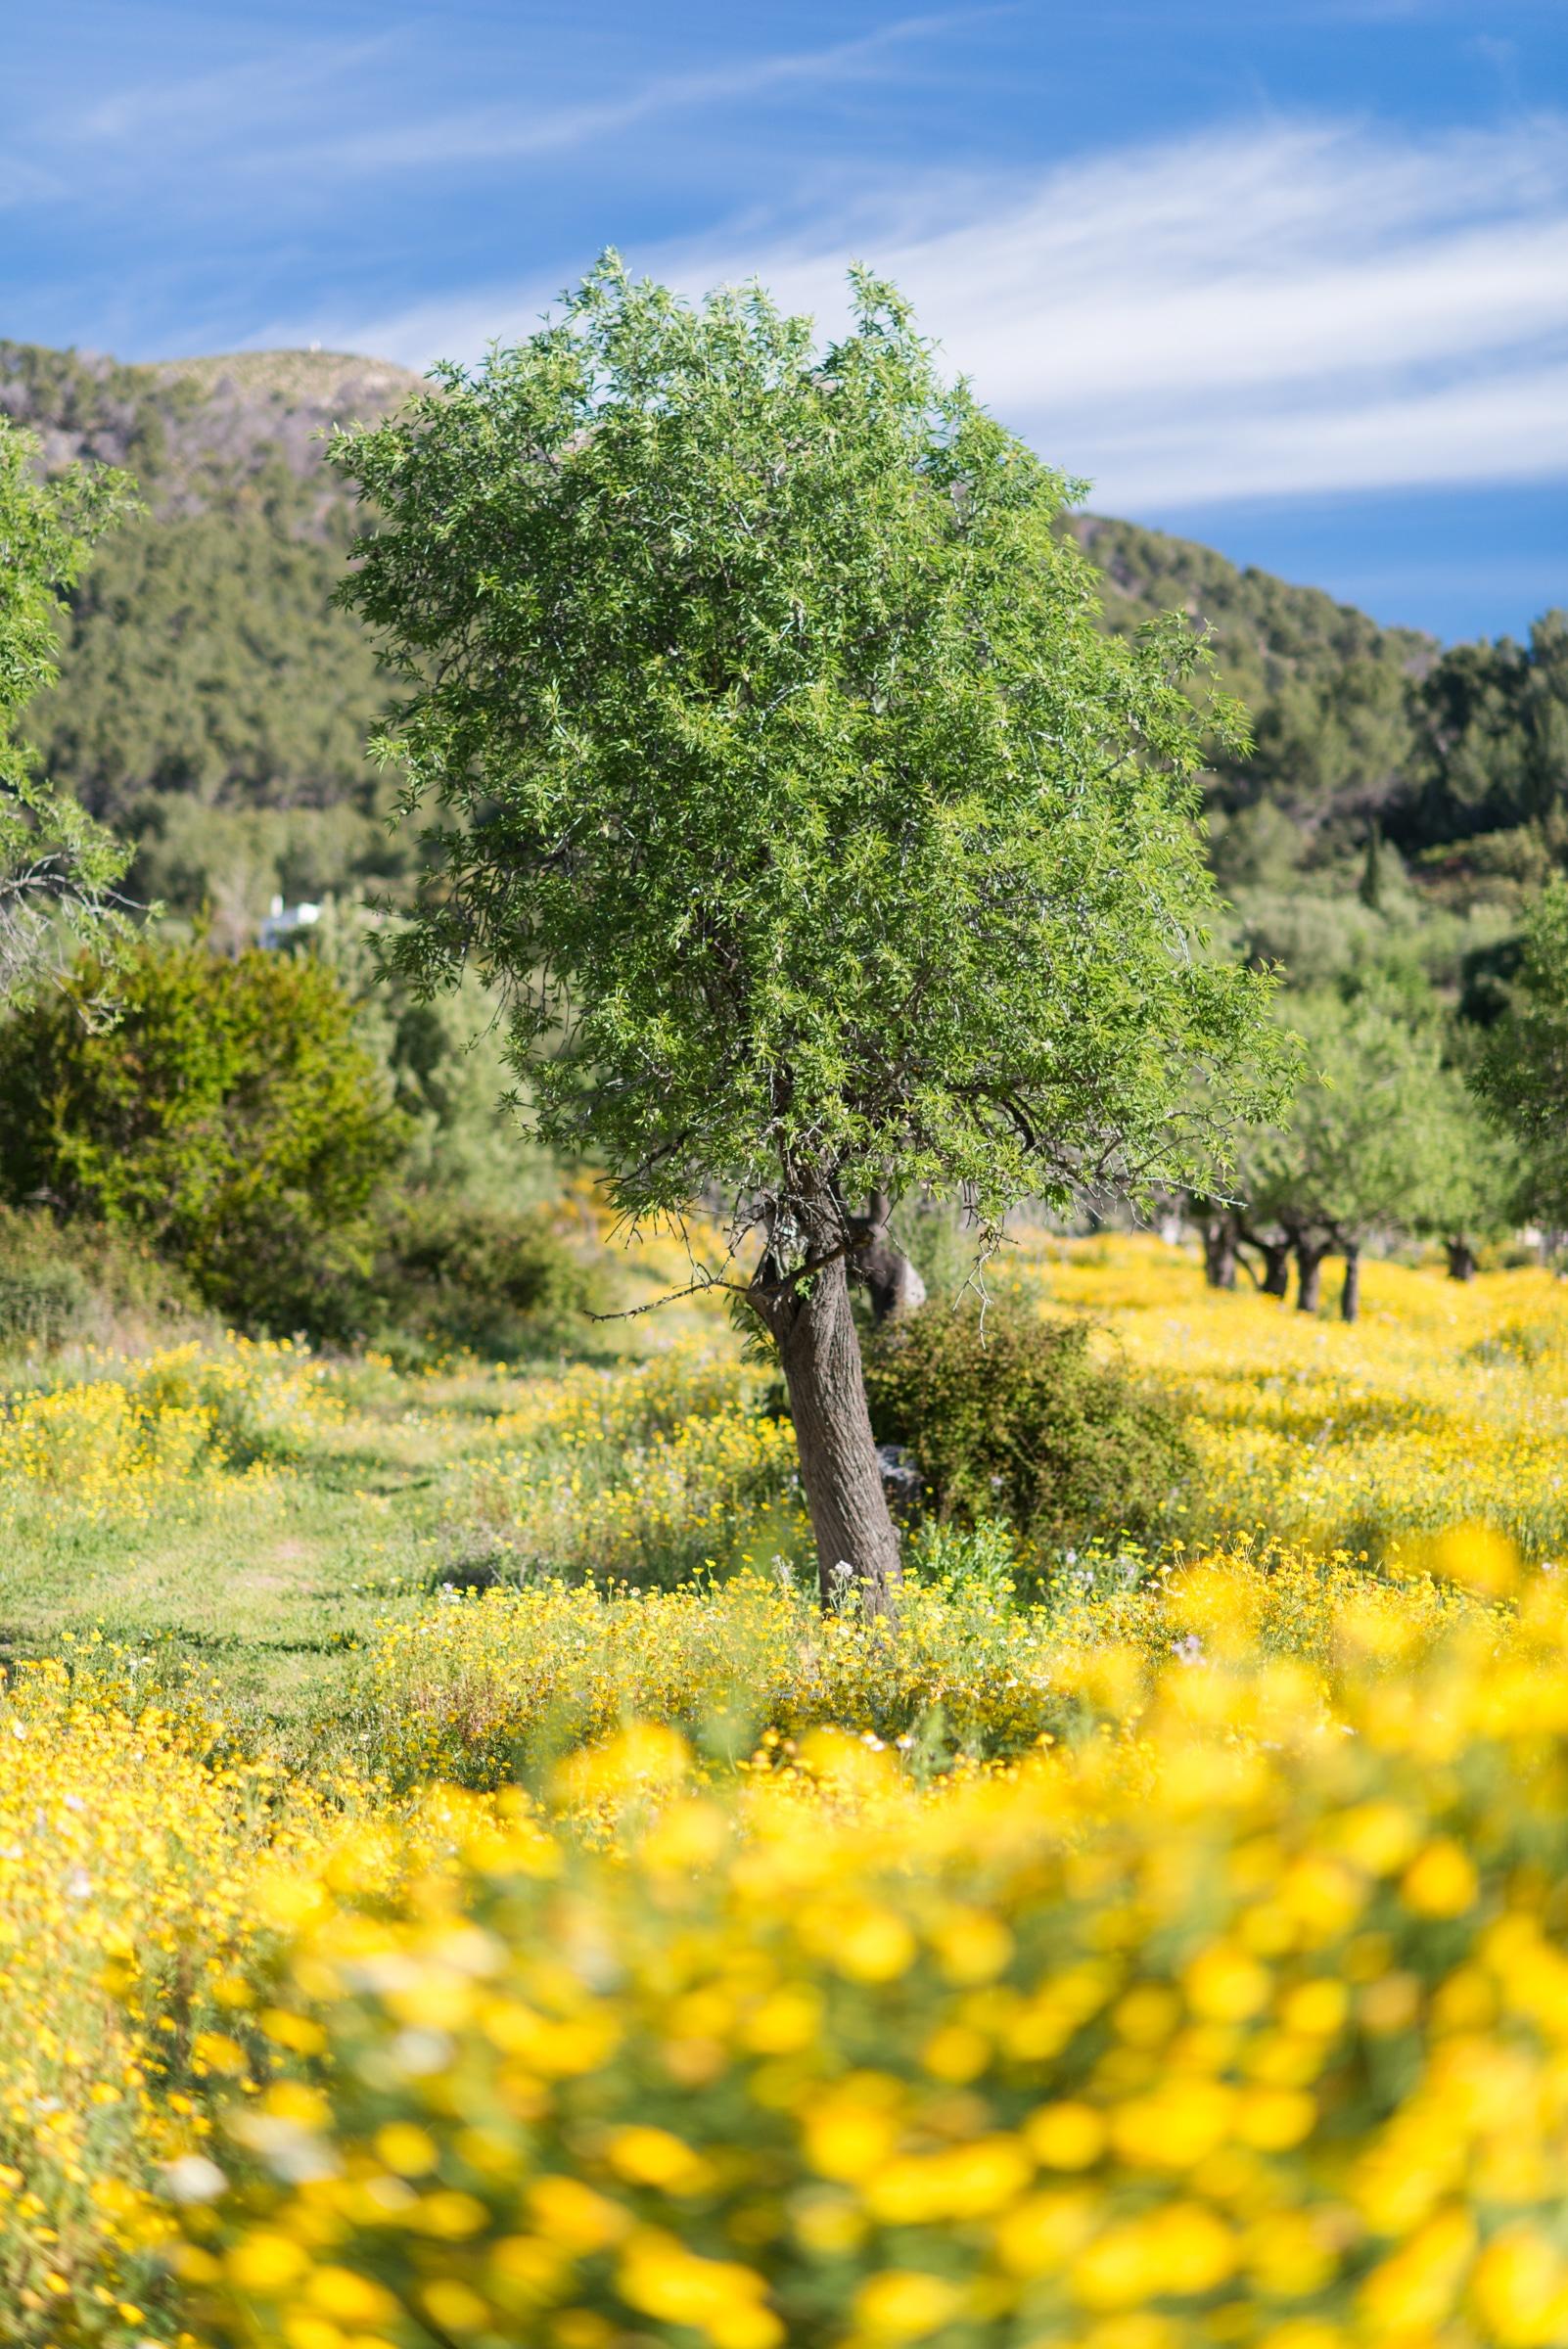 20150420 7548 - Mallorca in Spring